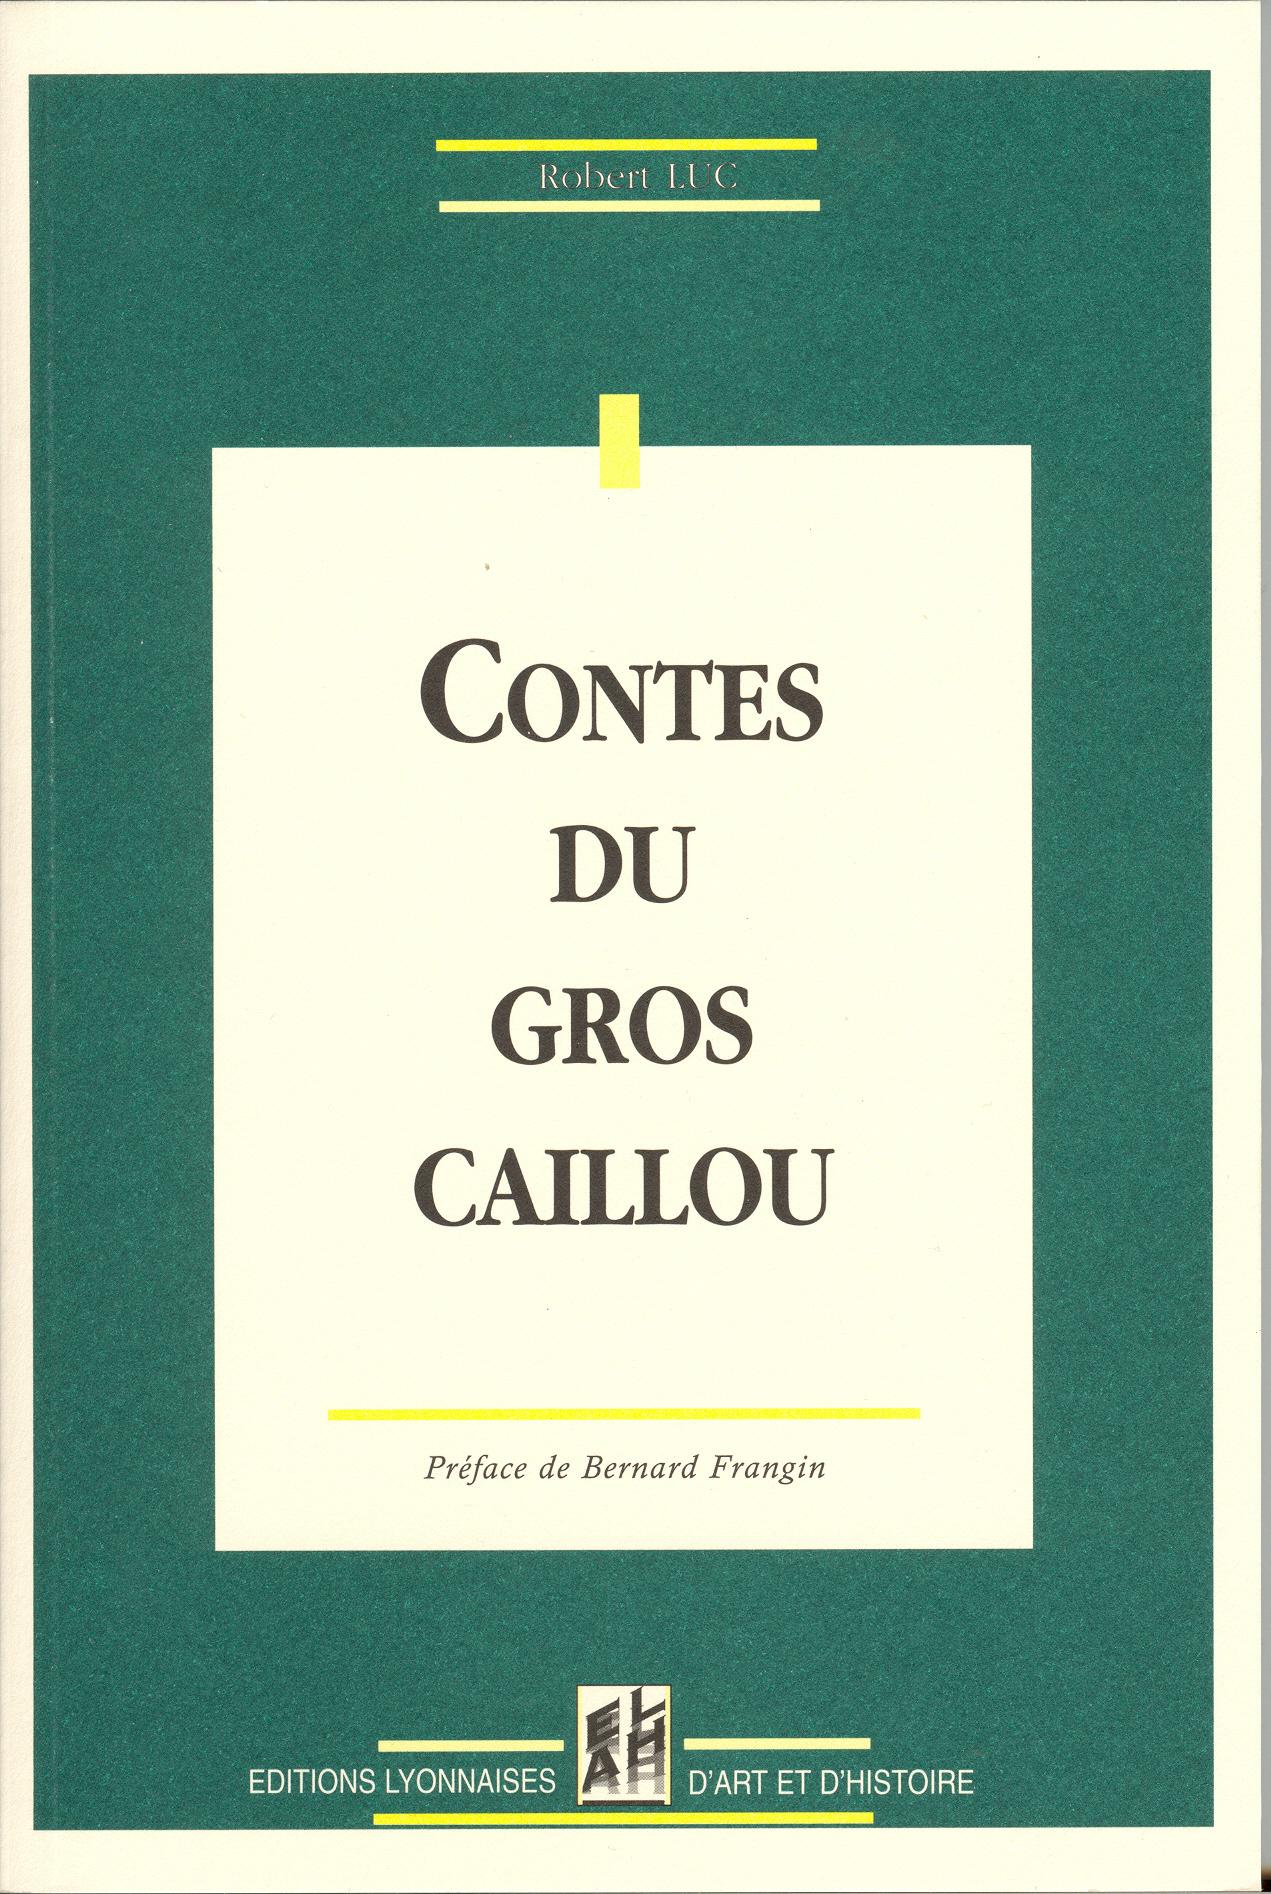 CONTES DU GROS CAILLOU